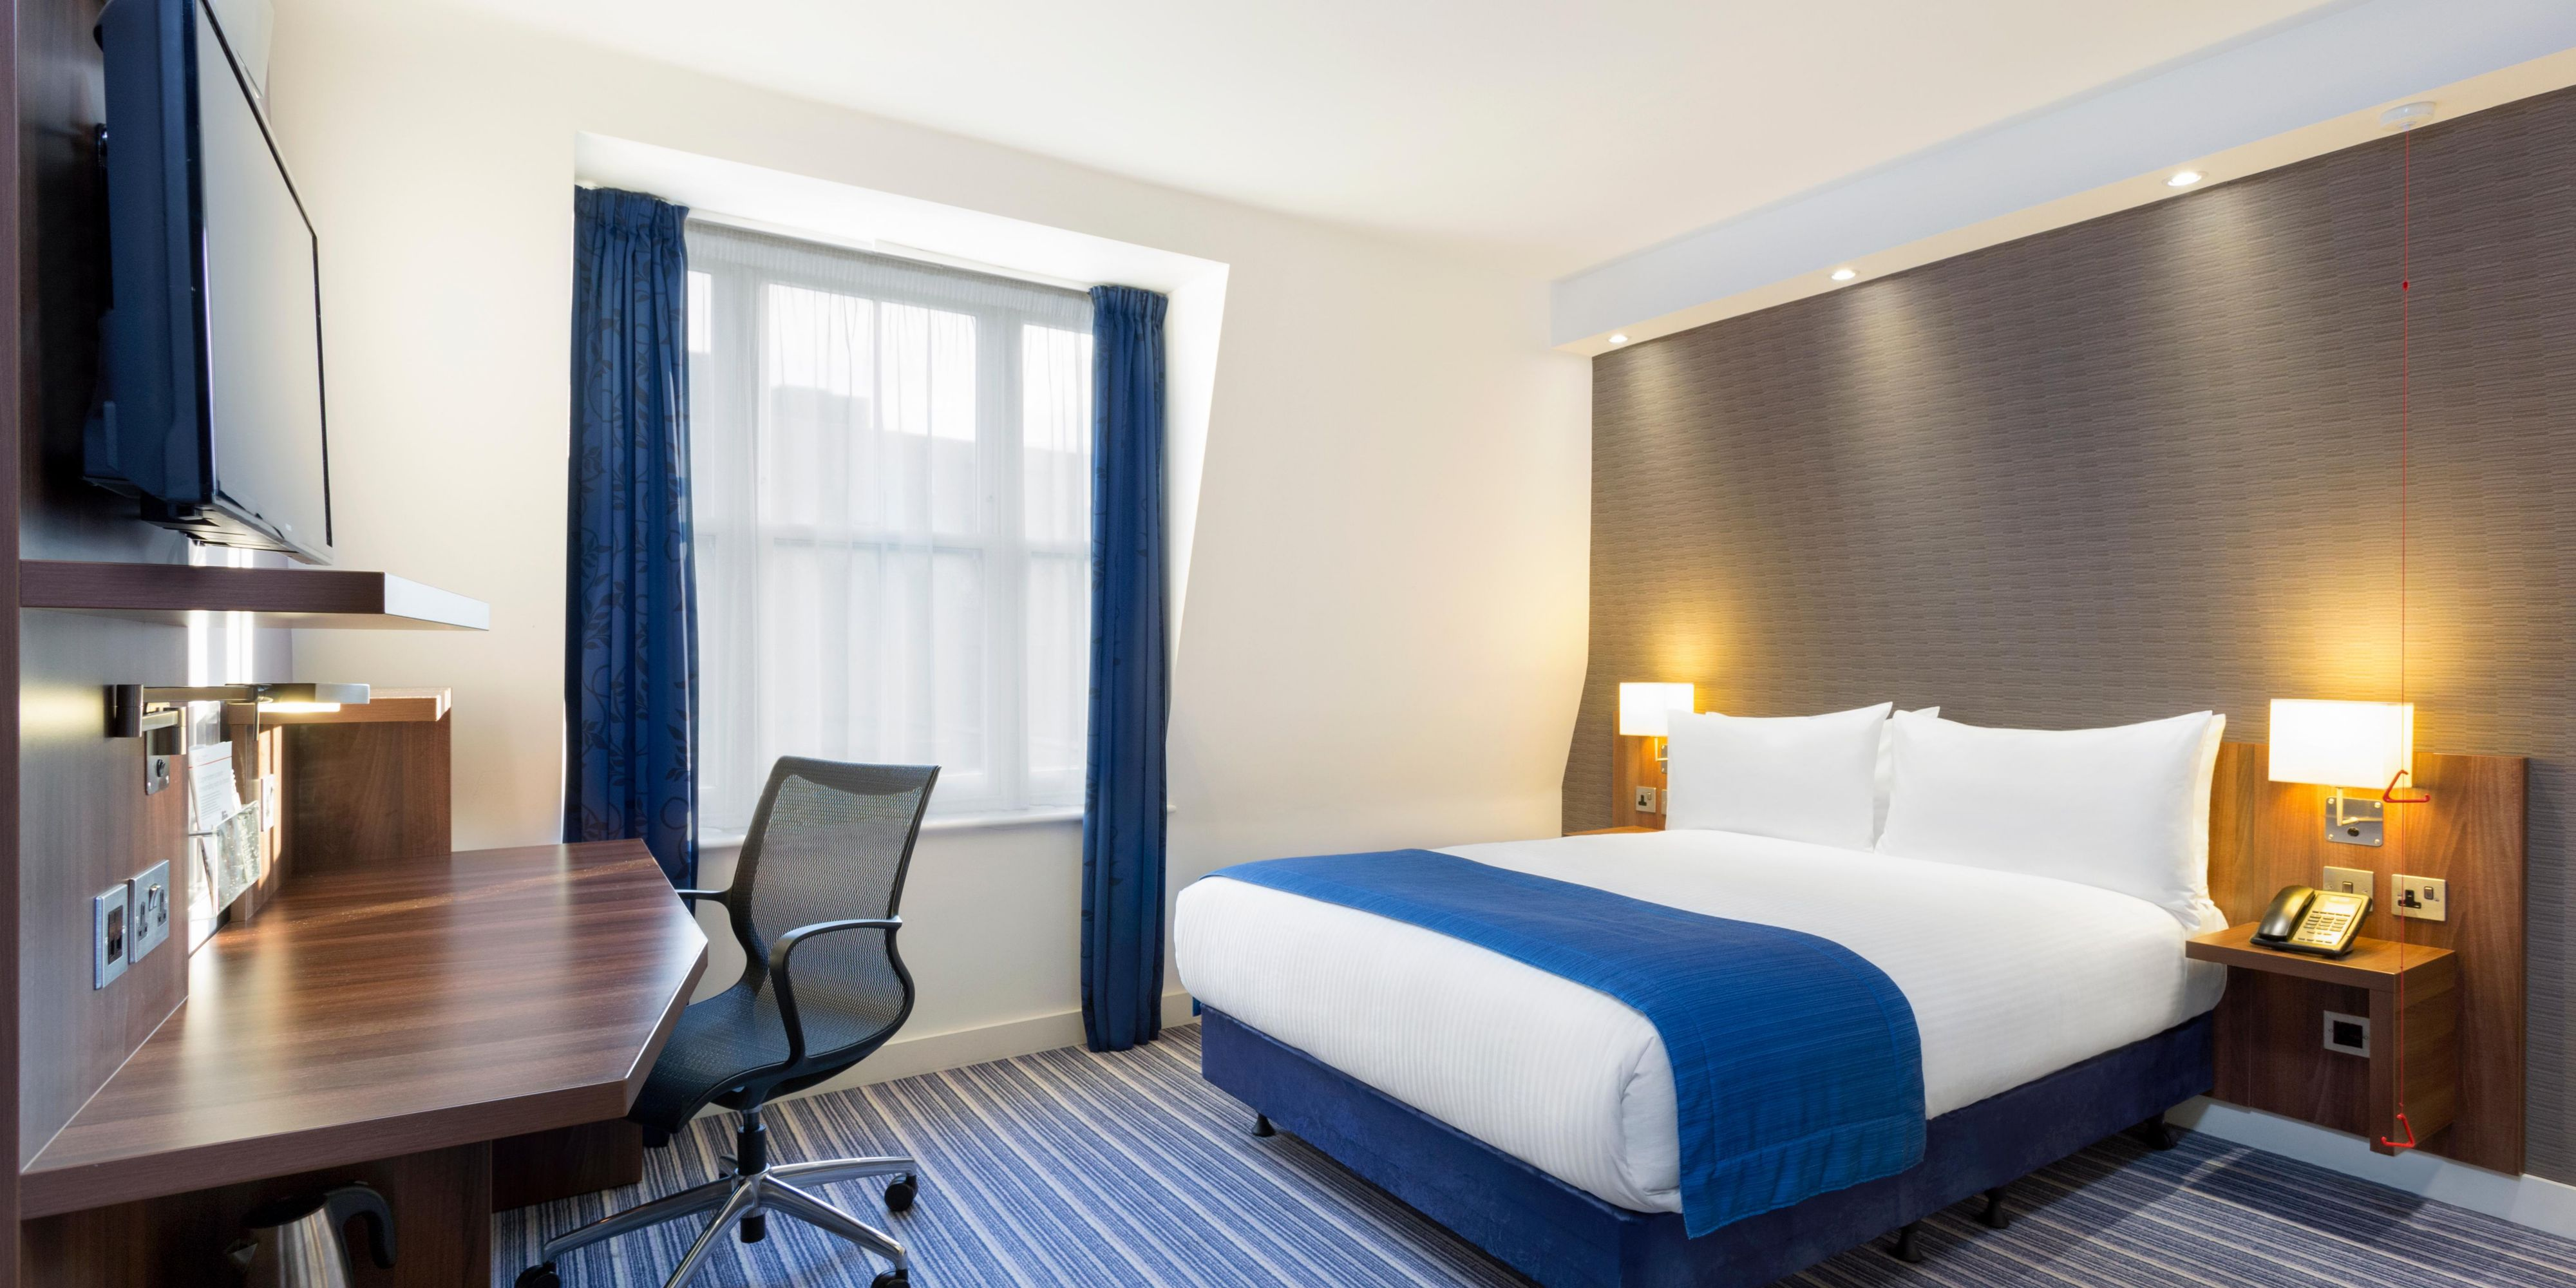 Holiday Inn Express London 5305187052 2x1